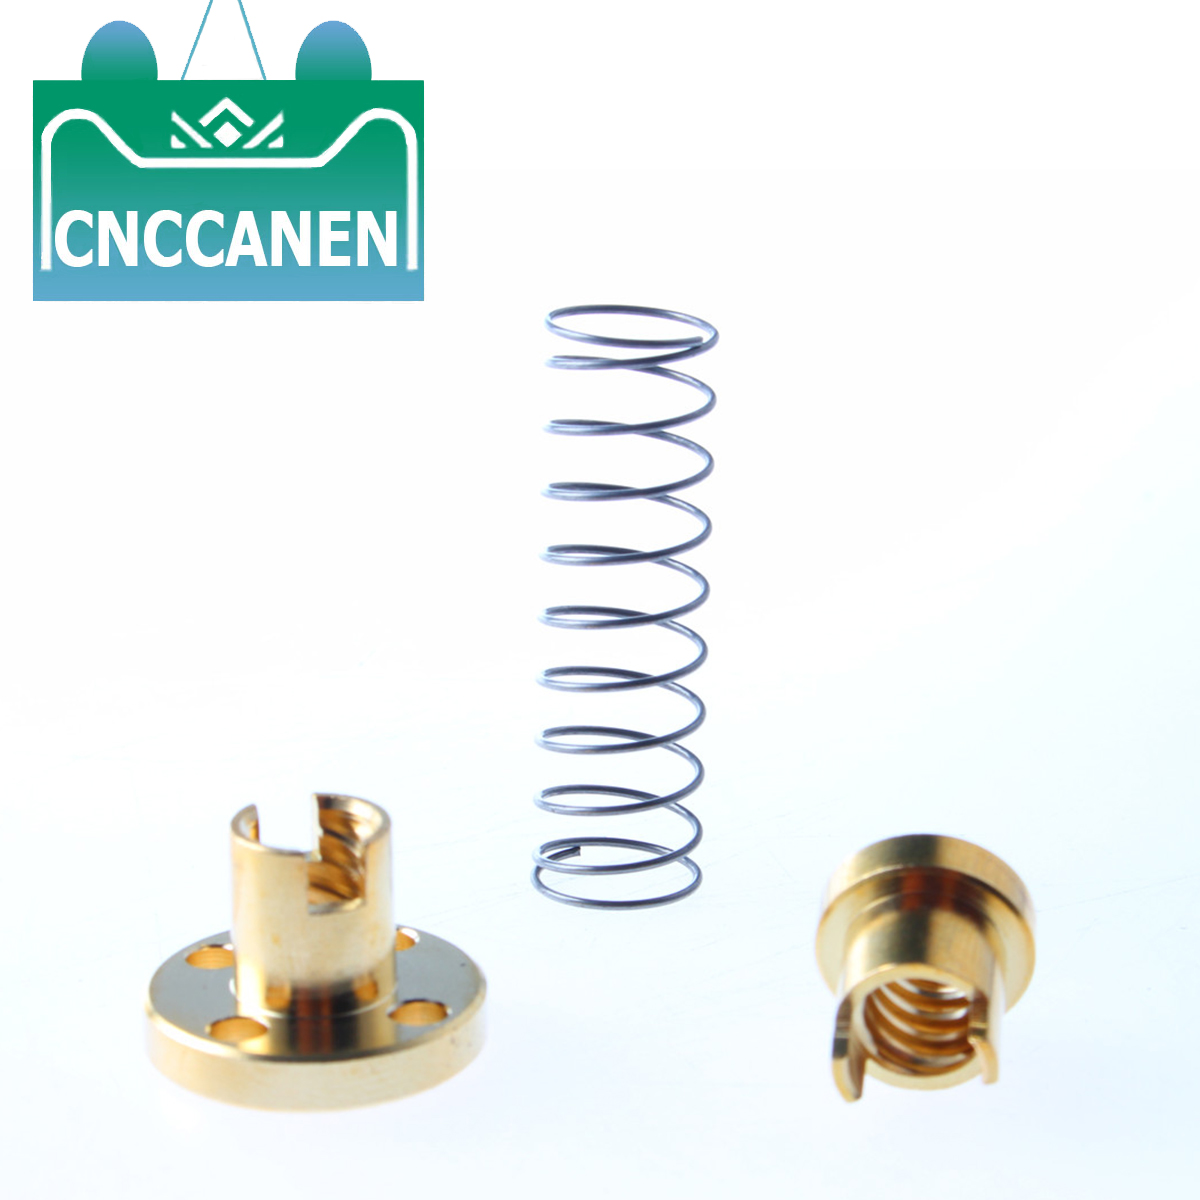 T8 Spring Loaded Anti Backlash Nut  Elimination Gap Nut For 8mm Acme Threaded Rod Lead Screws DIY CNC 3D Printer Parts